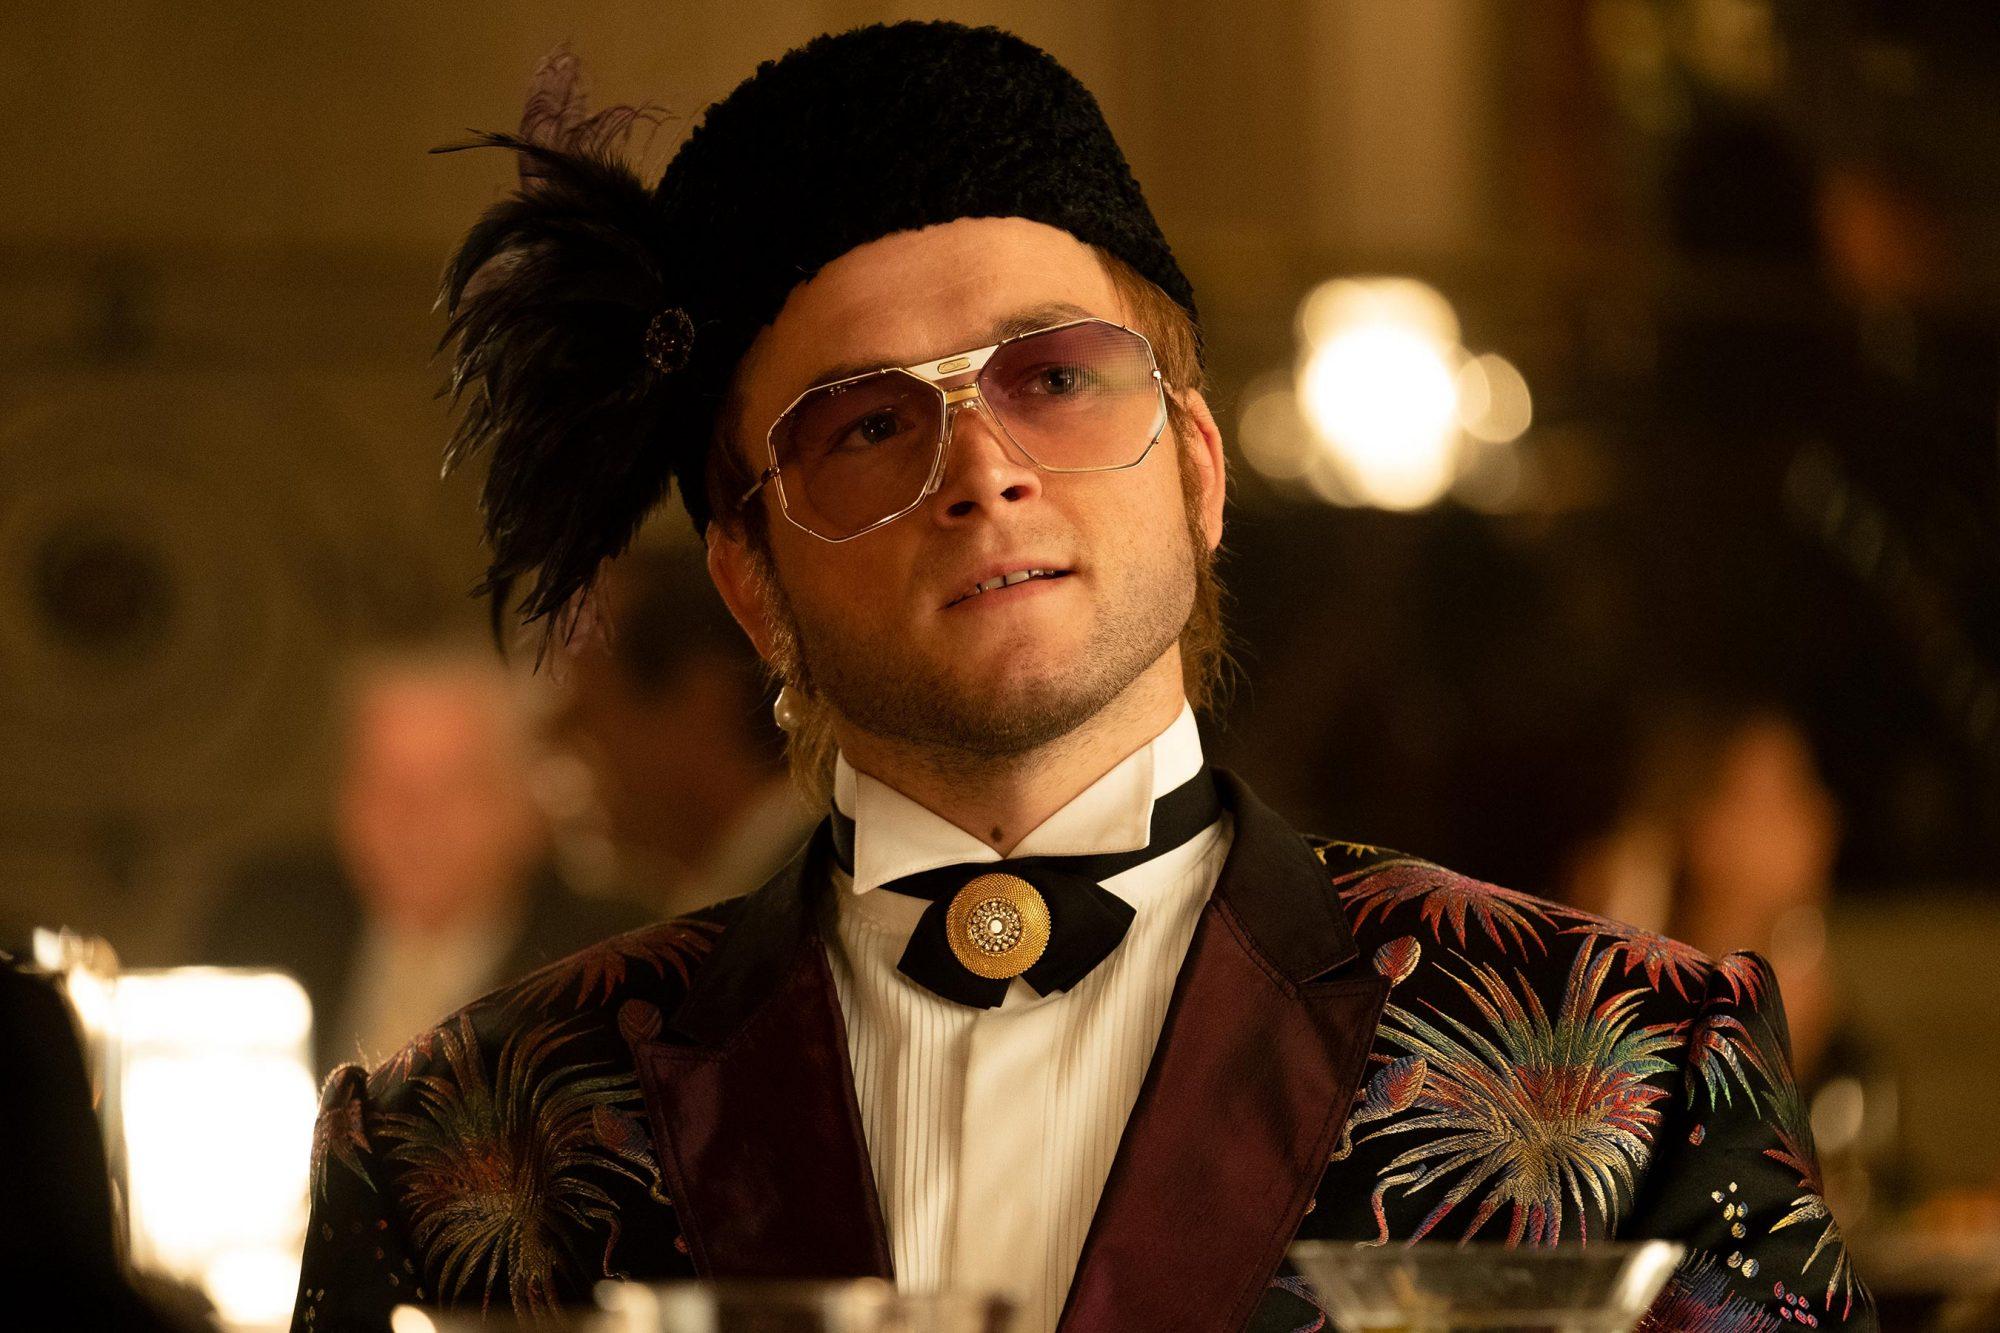 Rocketman Review Elton John Biopic Offers Razzle Dazzle Filmmaking With Heart Ew Com